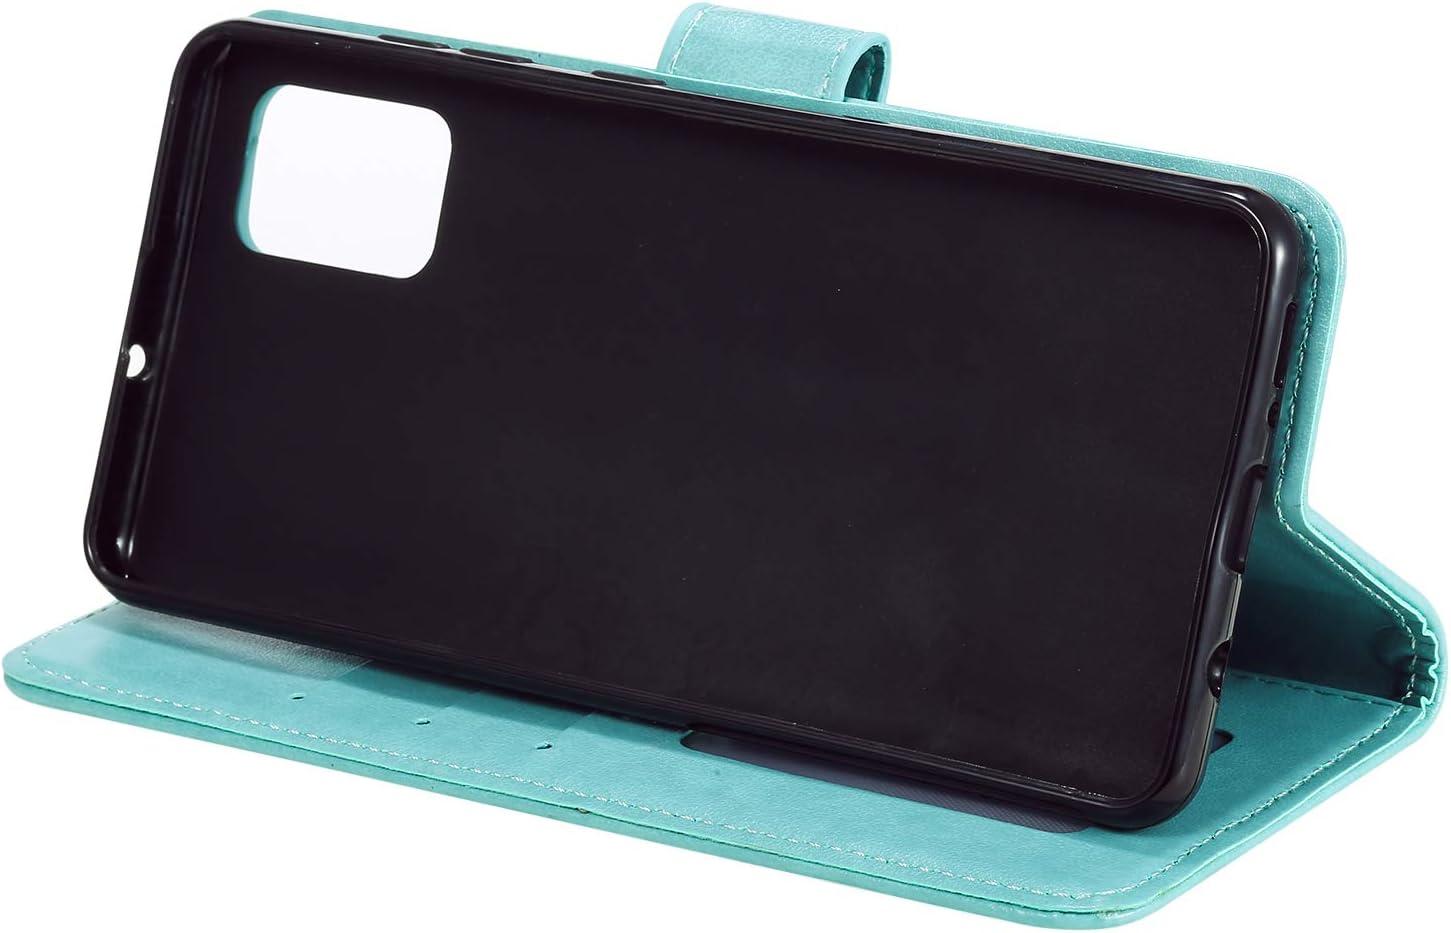 Brieftasche Handyh/ülle Klapph/ülle mit Kartenhalter Stossfest Lederh/ülle f/ür Samsung Galaxy A51 TOHHA080424 Blau Tosim Galaxy A51 H/ülle Klappbar Leder